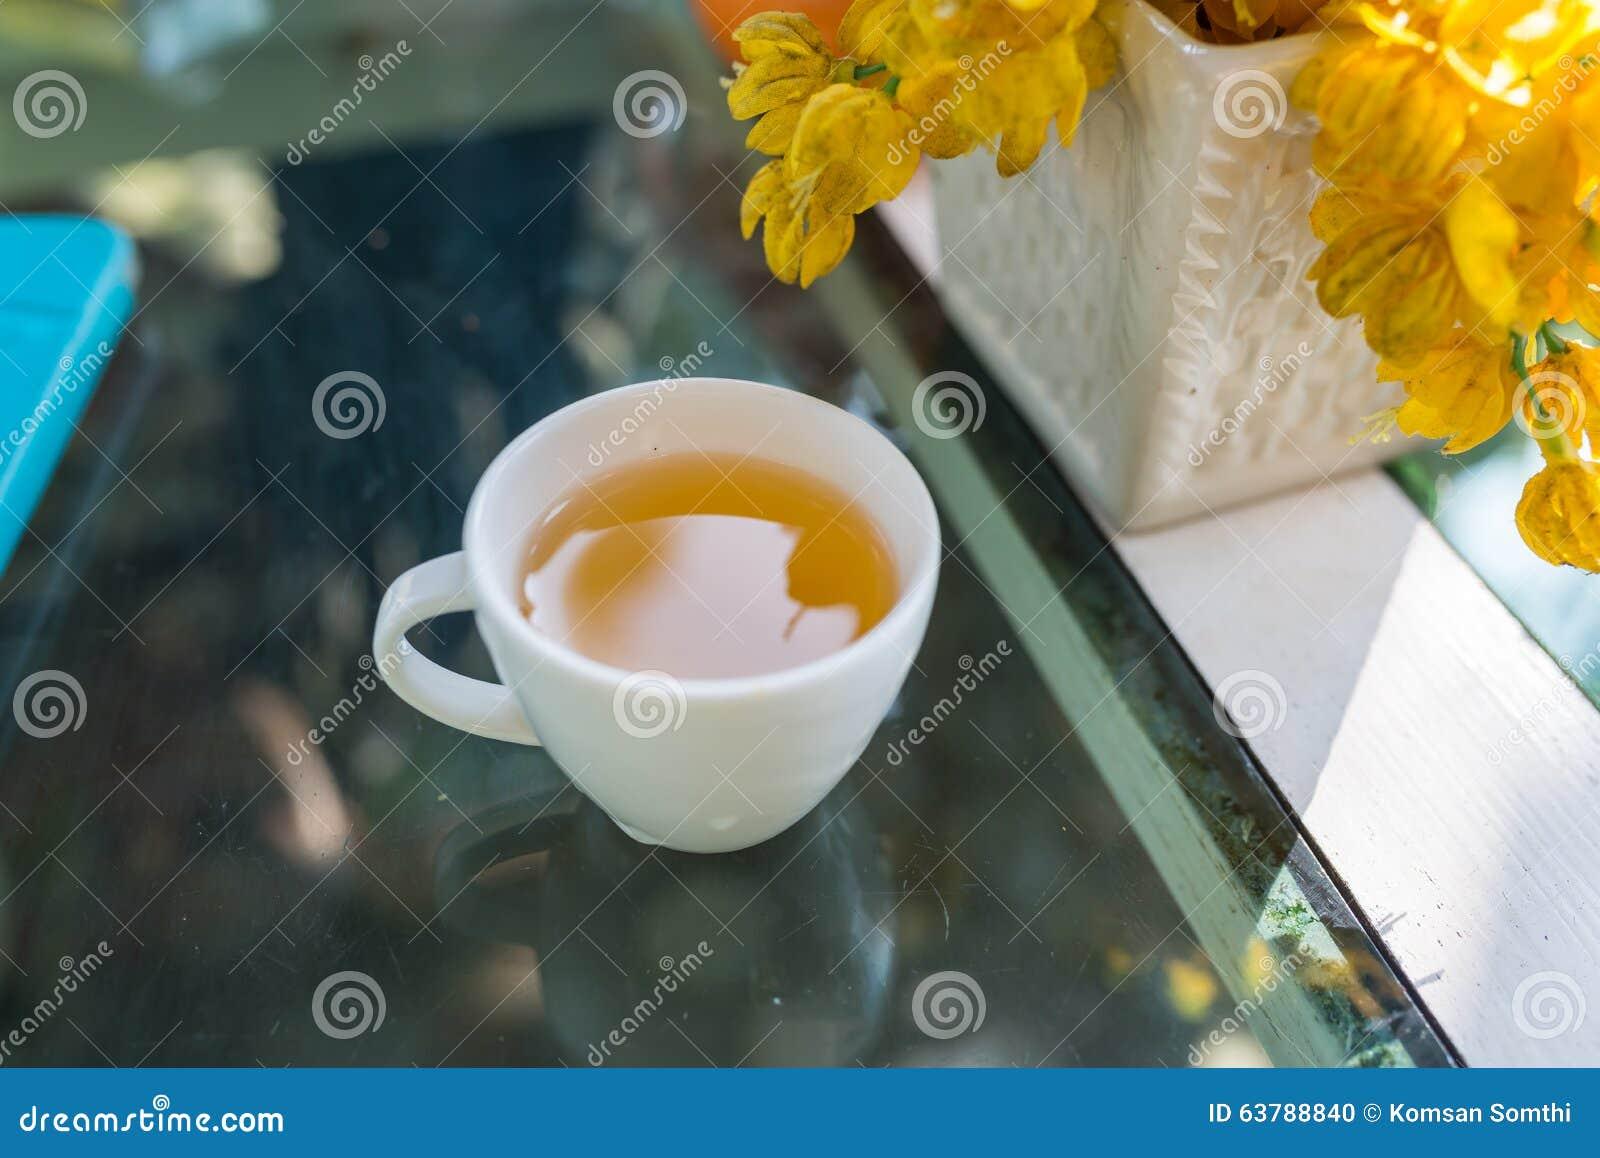 Den vita koppen häller varmt grönt te